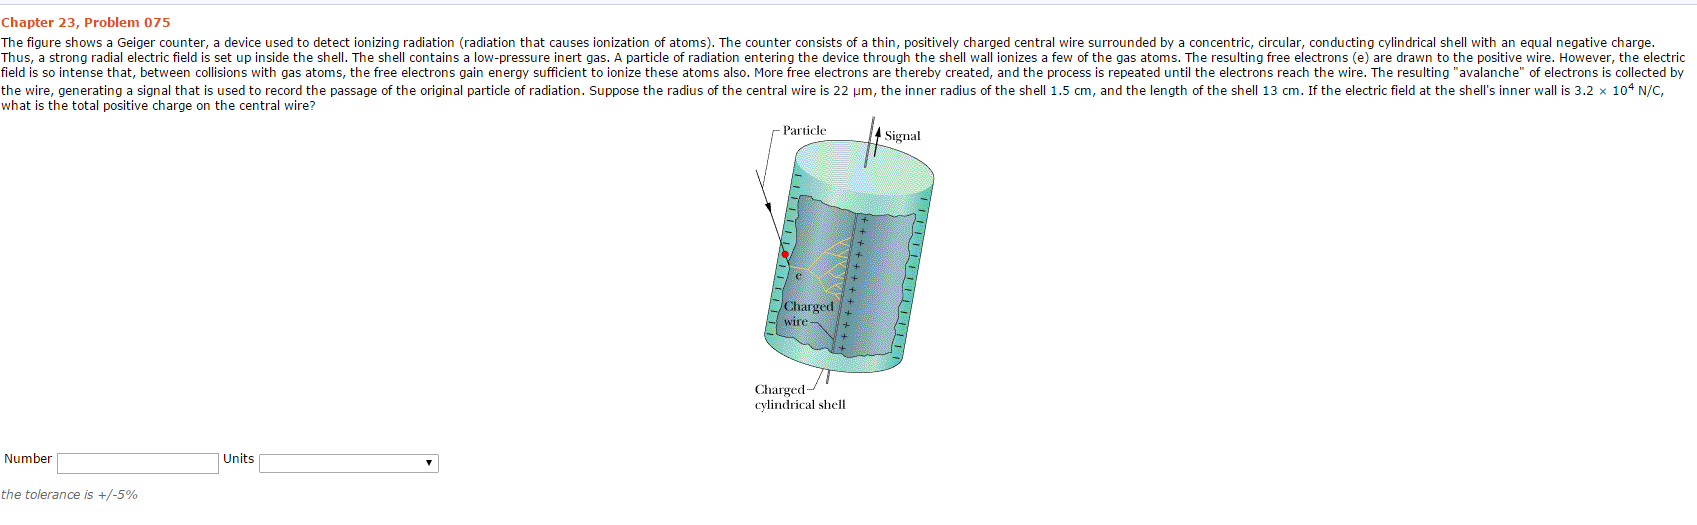 Advanced Physics Archive   January 25, 2016   Chegg.com